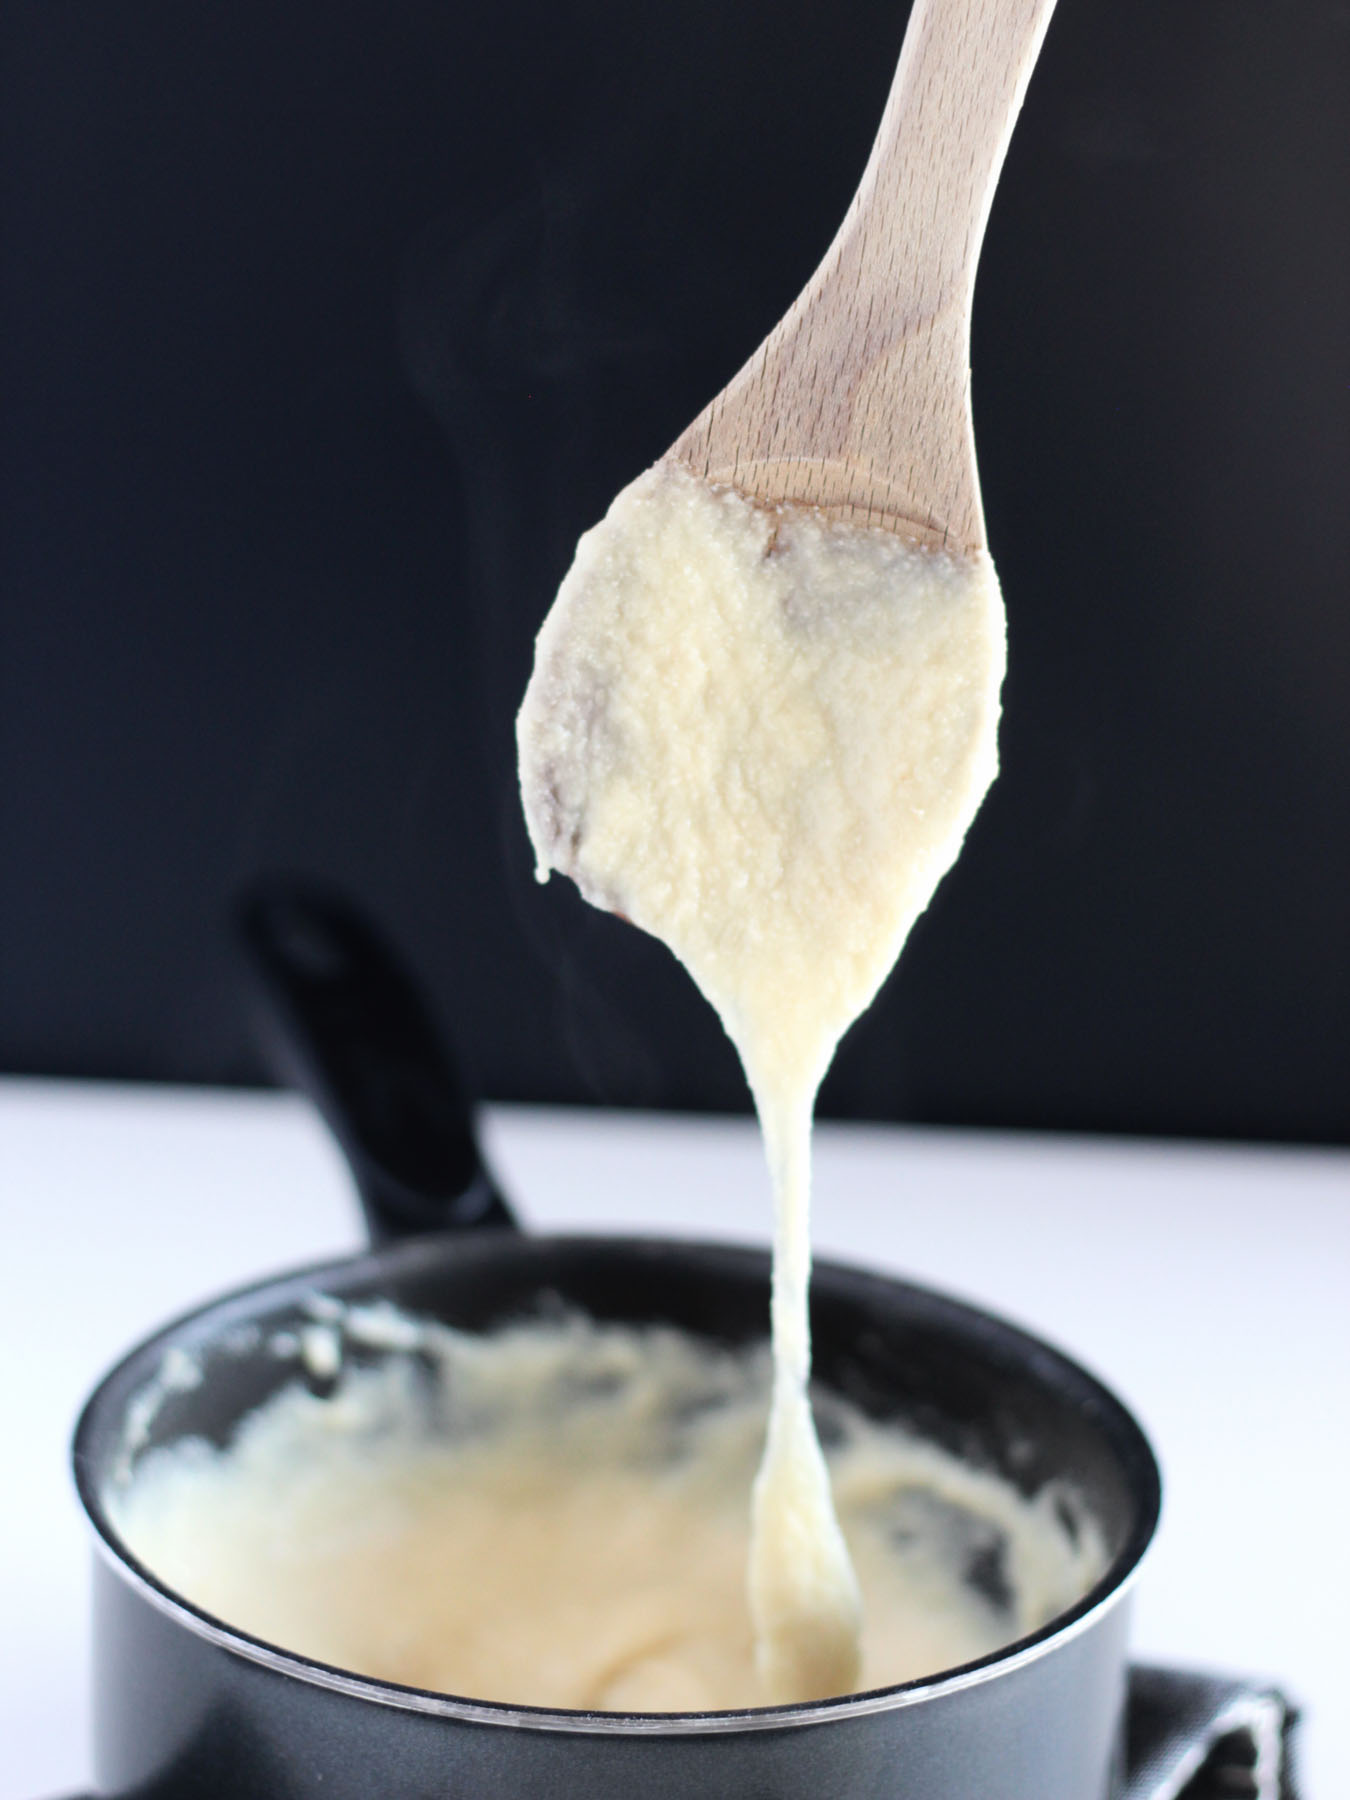 EASY 10 Minute Stretchy Gooey Vegan Mozzarella Cheese Recipe